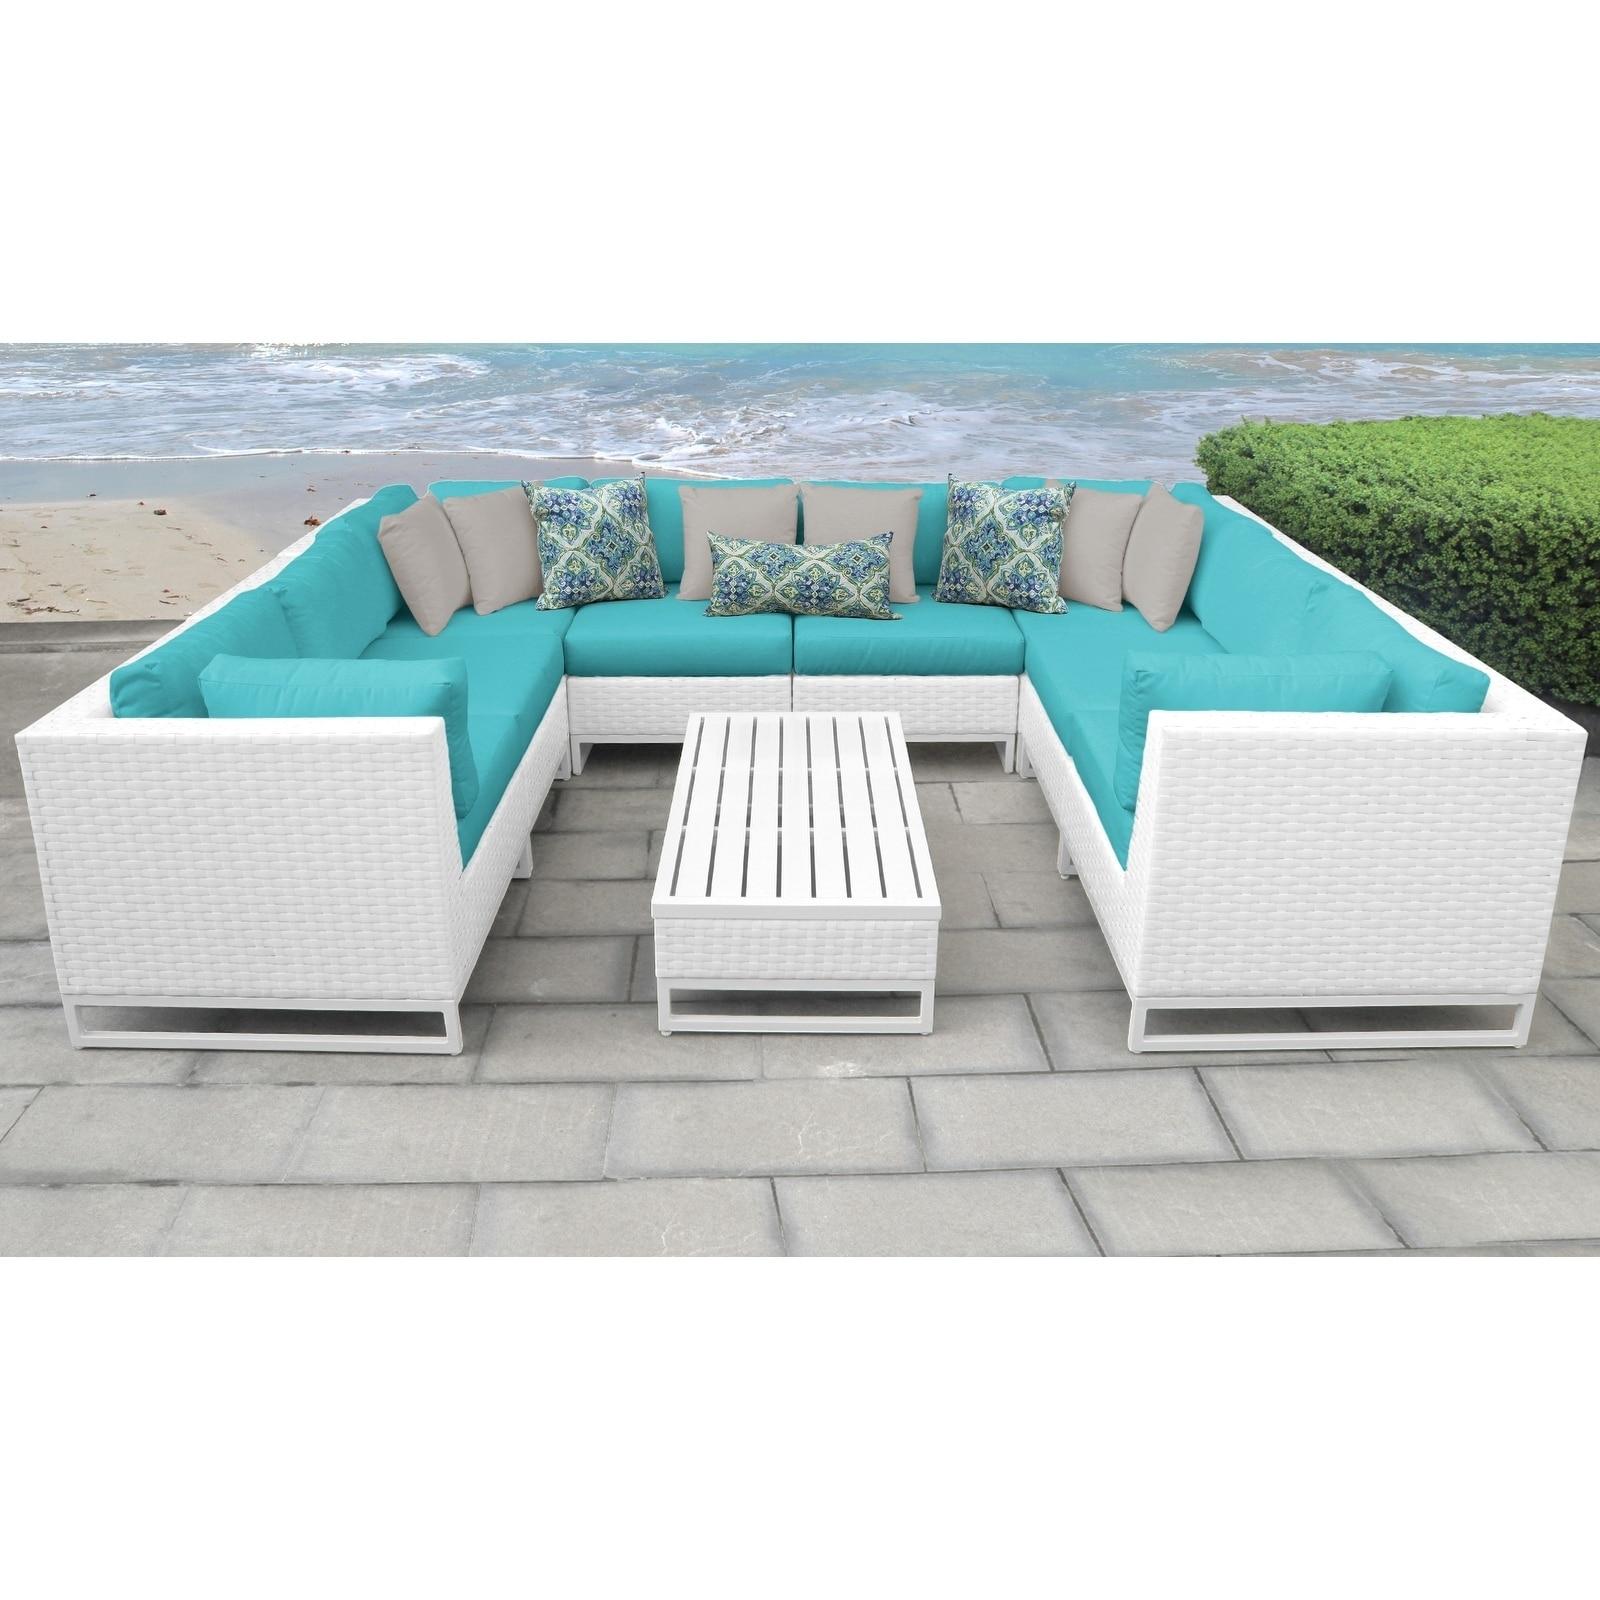 Miami 9 Piece Outdoor Wicker Patio Furniture Set